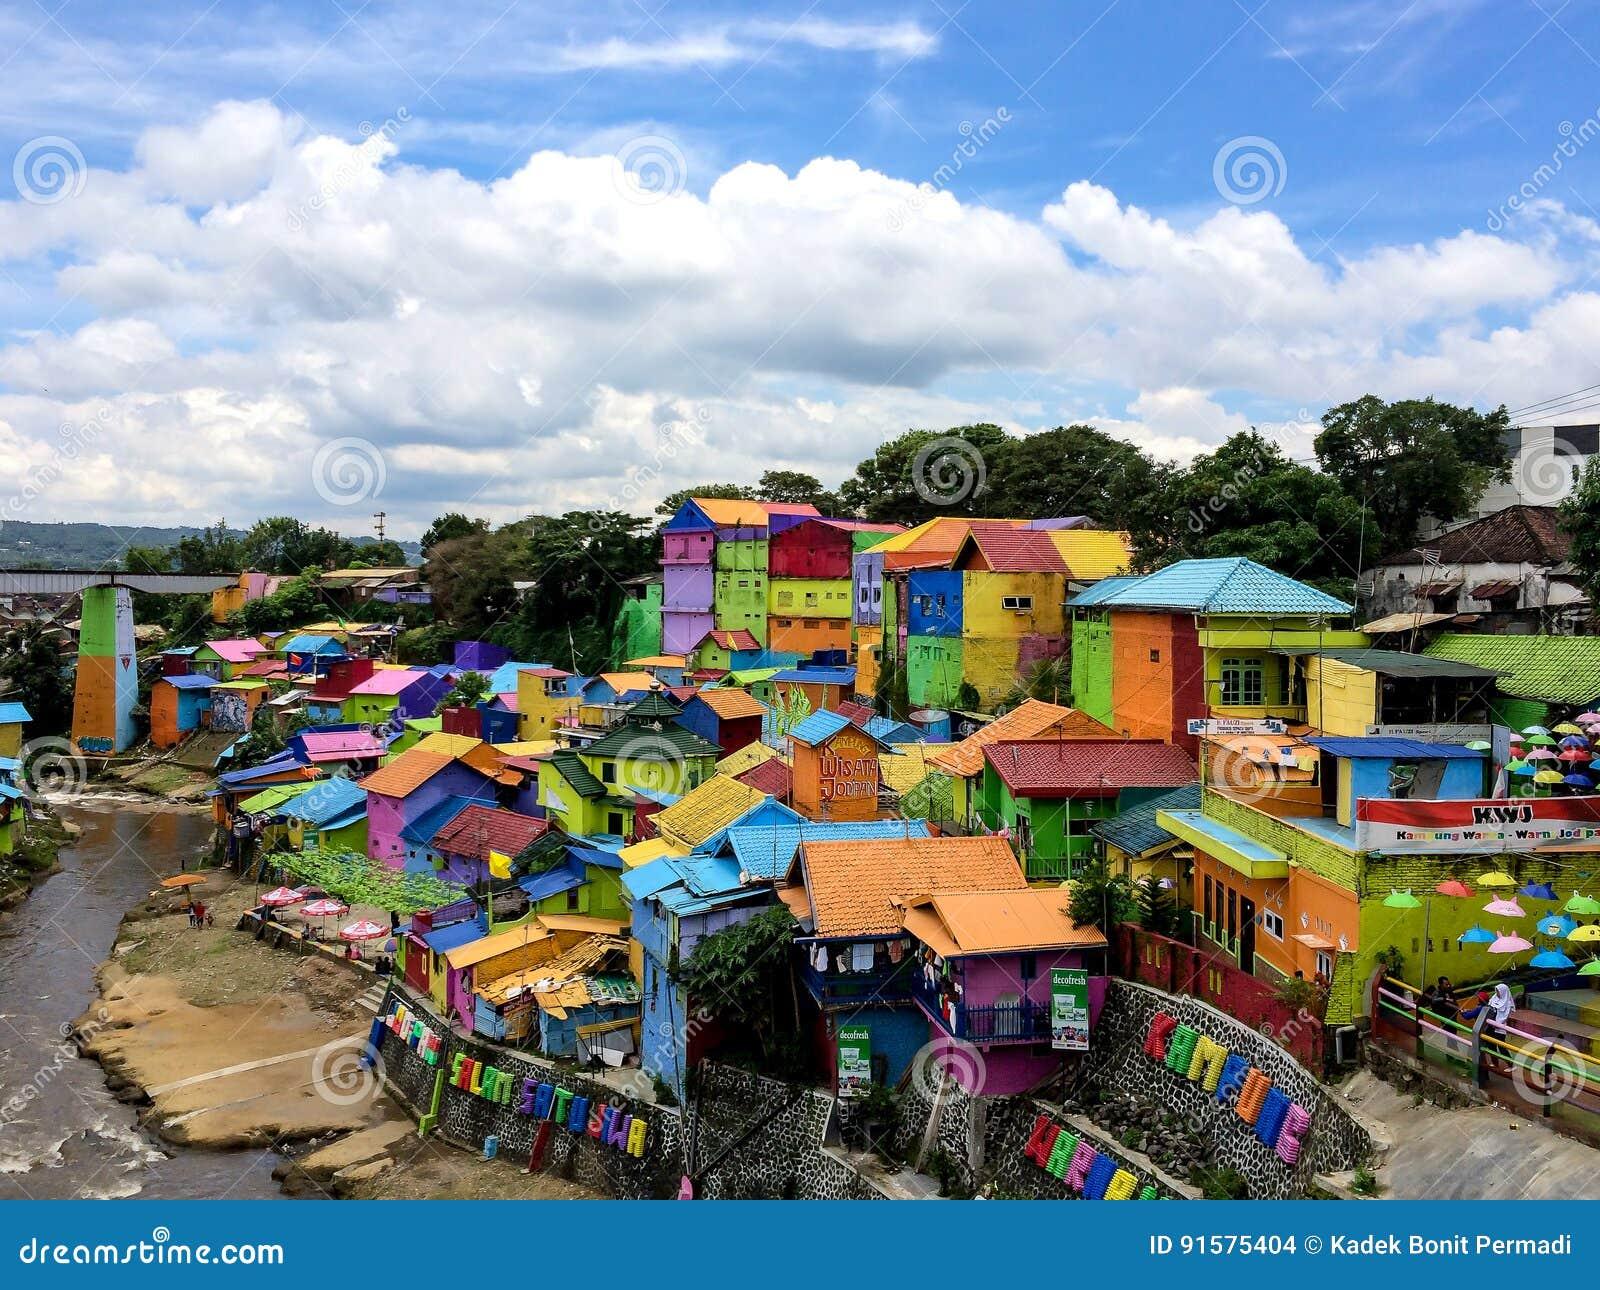 The Colorful Houses Of Kampung Warna Warni In Jodipan